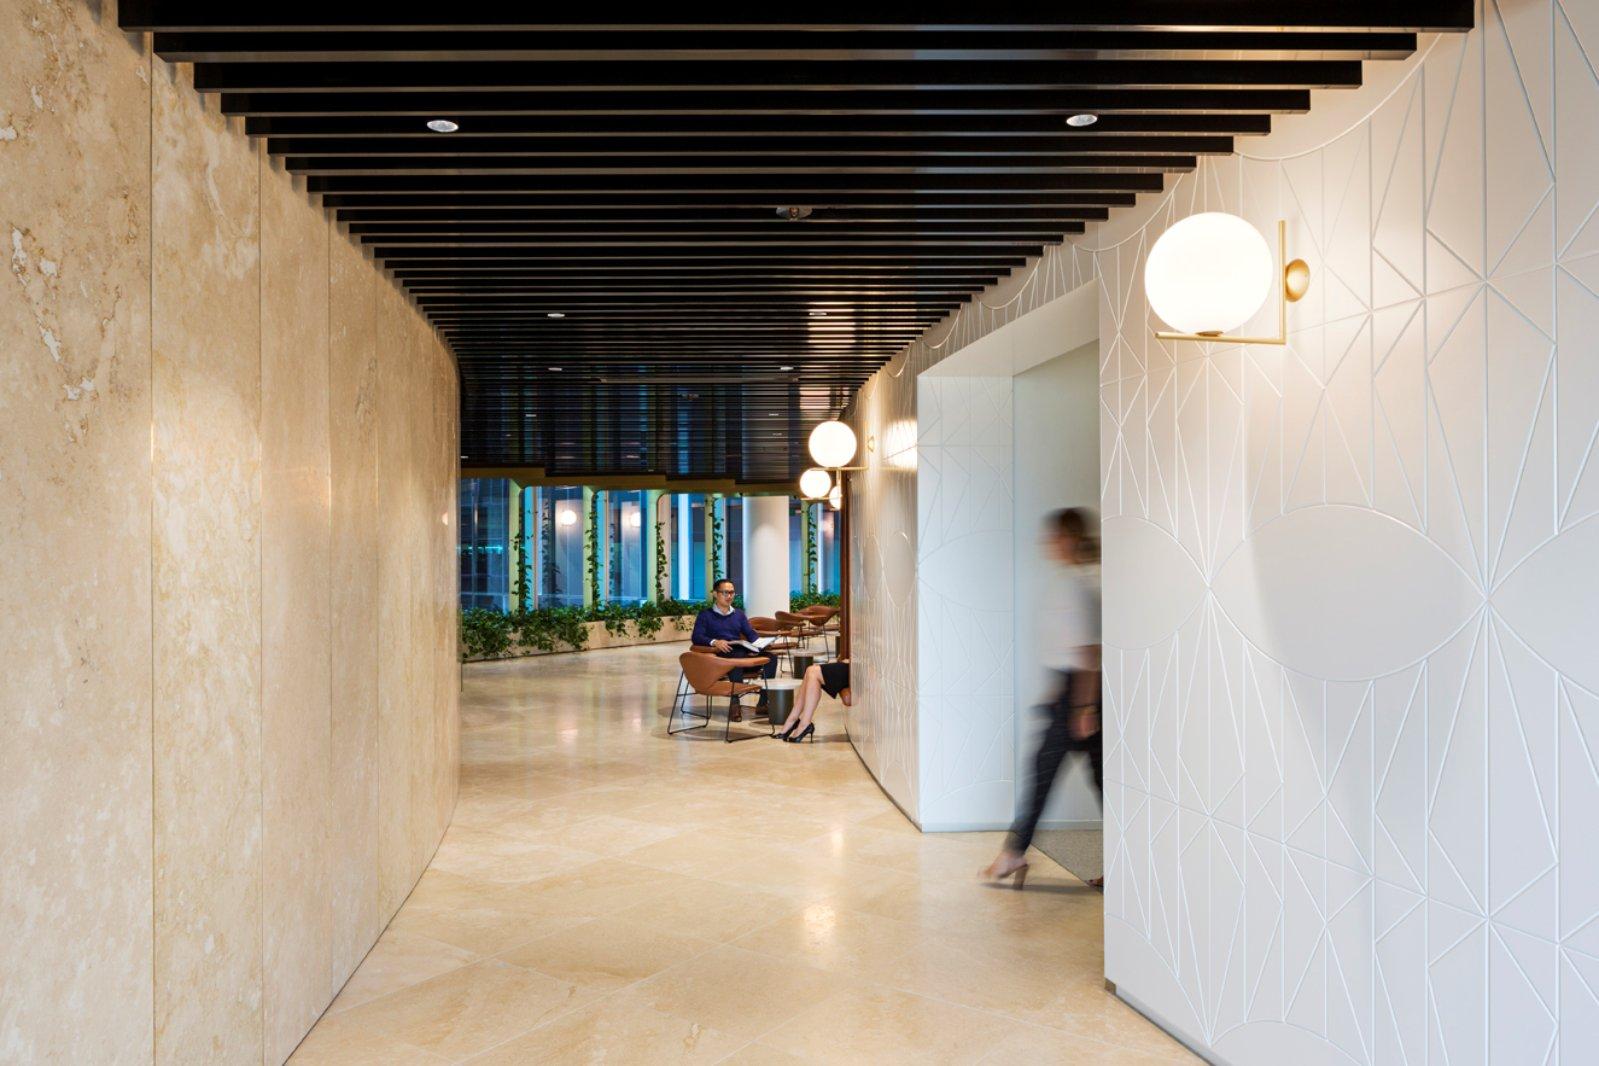 DLA Piper's new Brisbane workspace